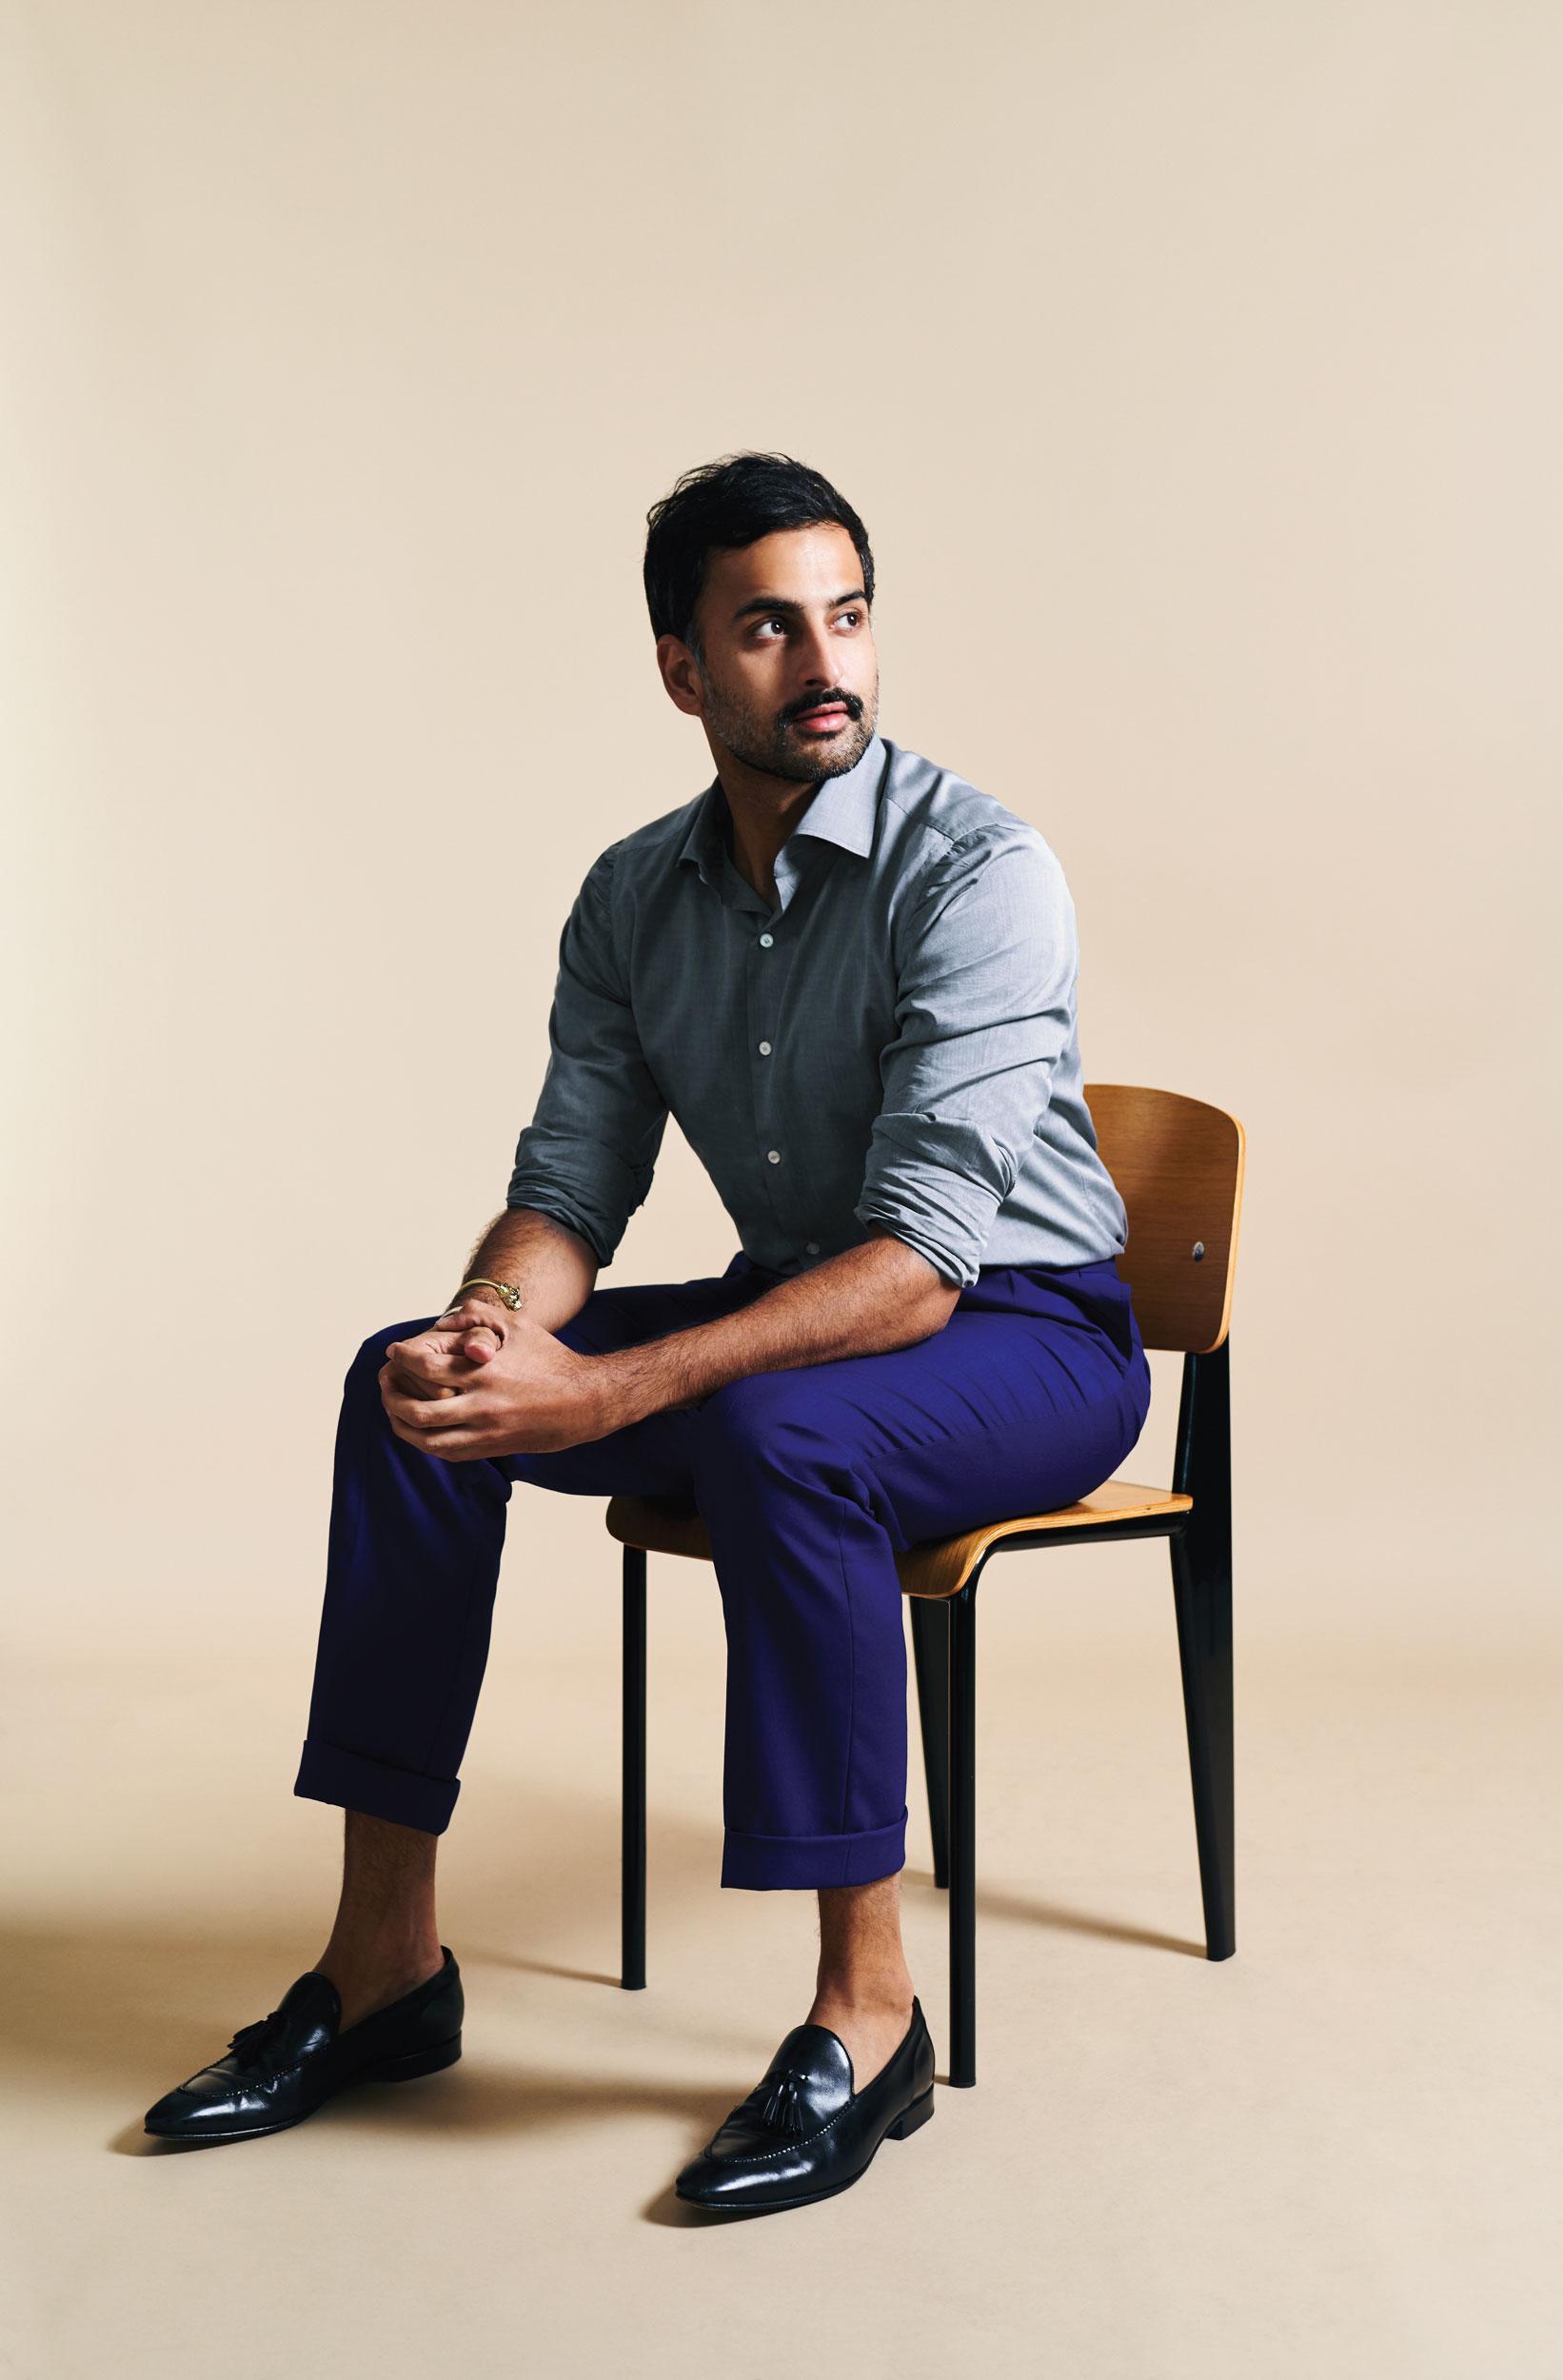 Syed Asim Hussain  The blacksheep restaurants For GenT. Asia Tatler